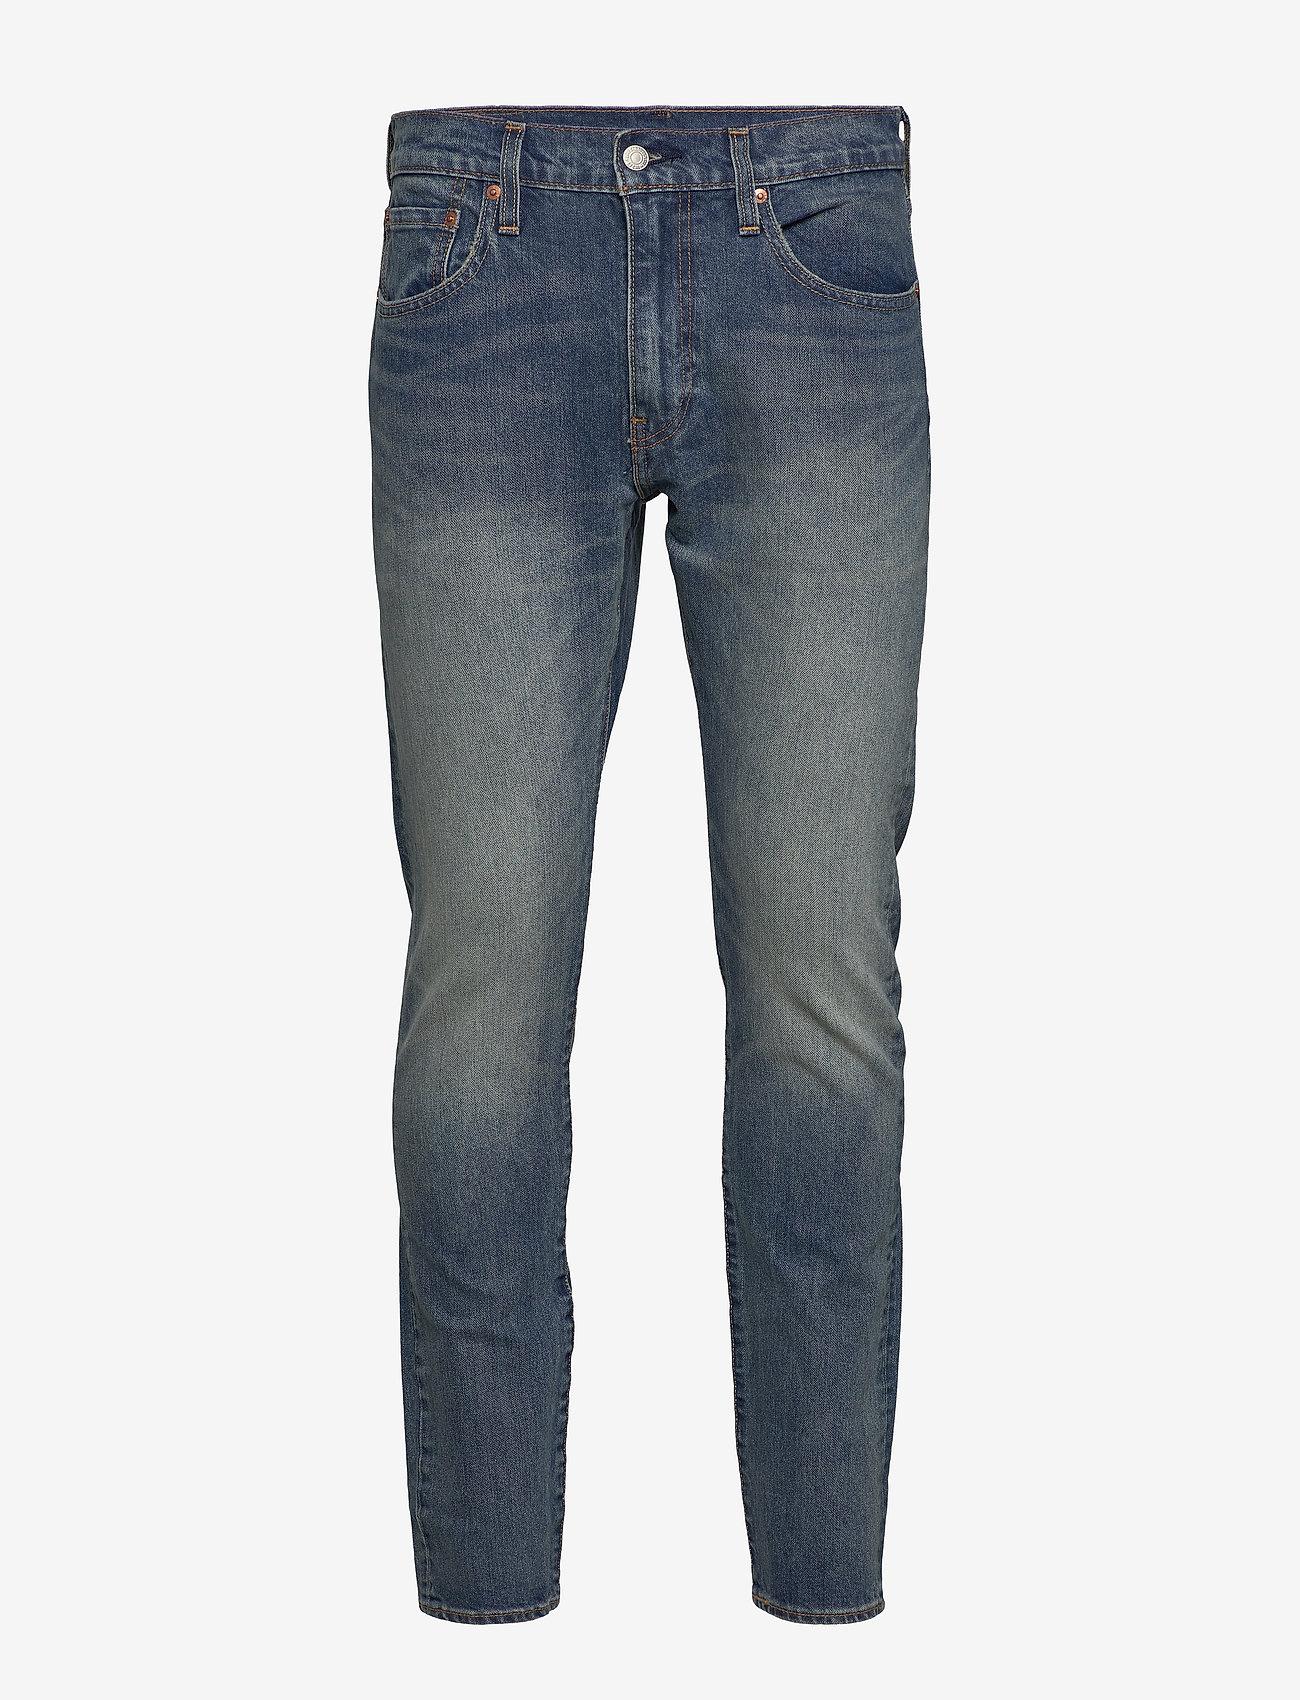 LEVI´S Men - 512 SLIM TAPER YELL AND SHOUT - slim jeans - dark indigo - worn in - 0